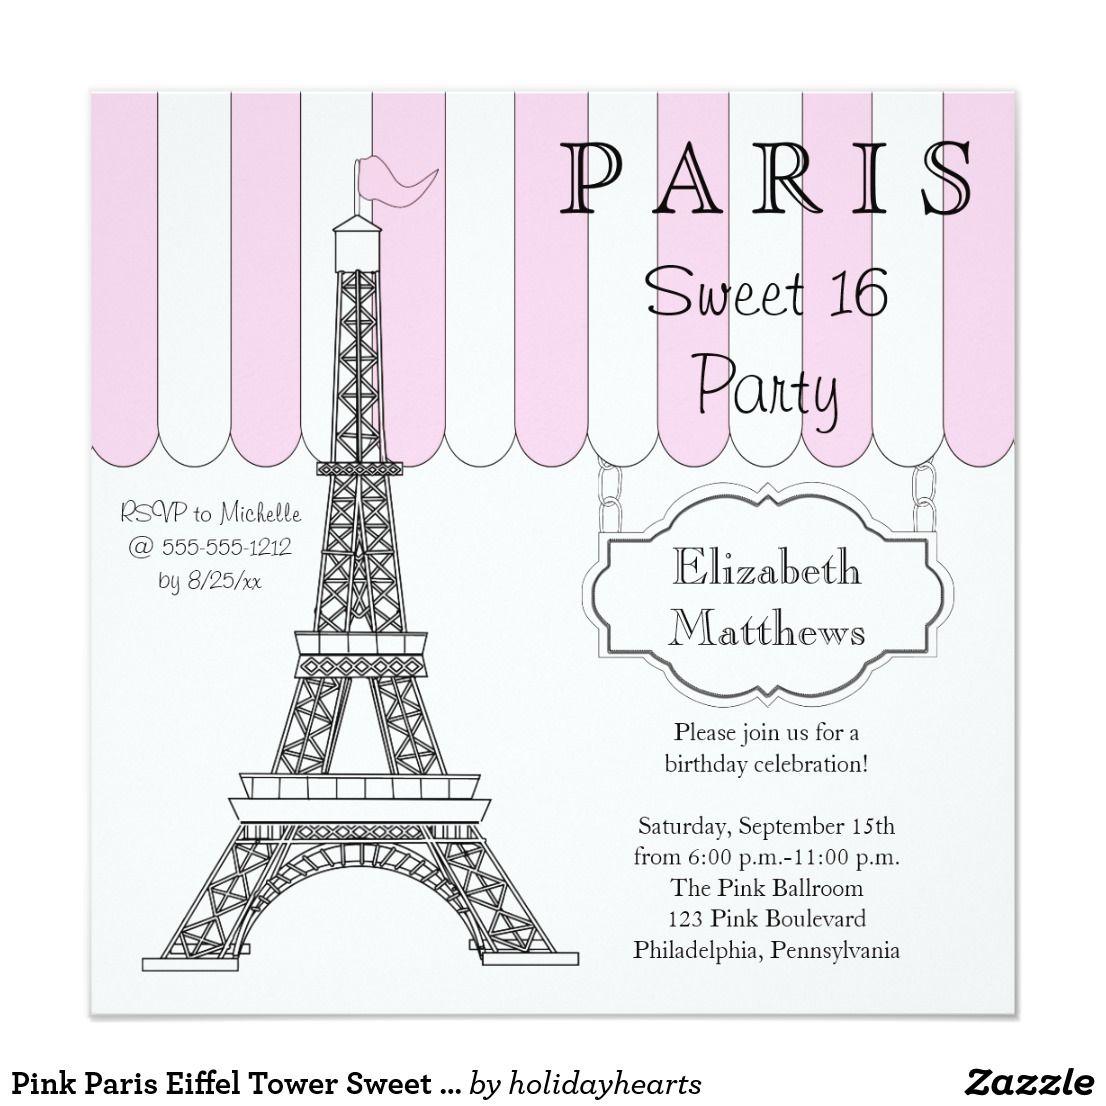 Pink Paris Eiffel Tower Sweet 16 Party Invitation | { Happy Birthday ...